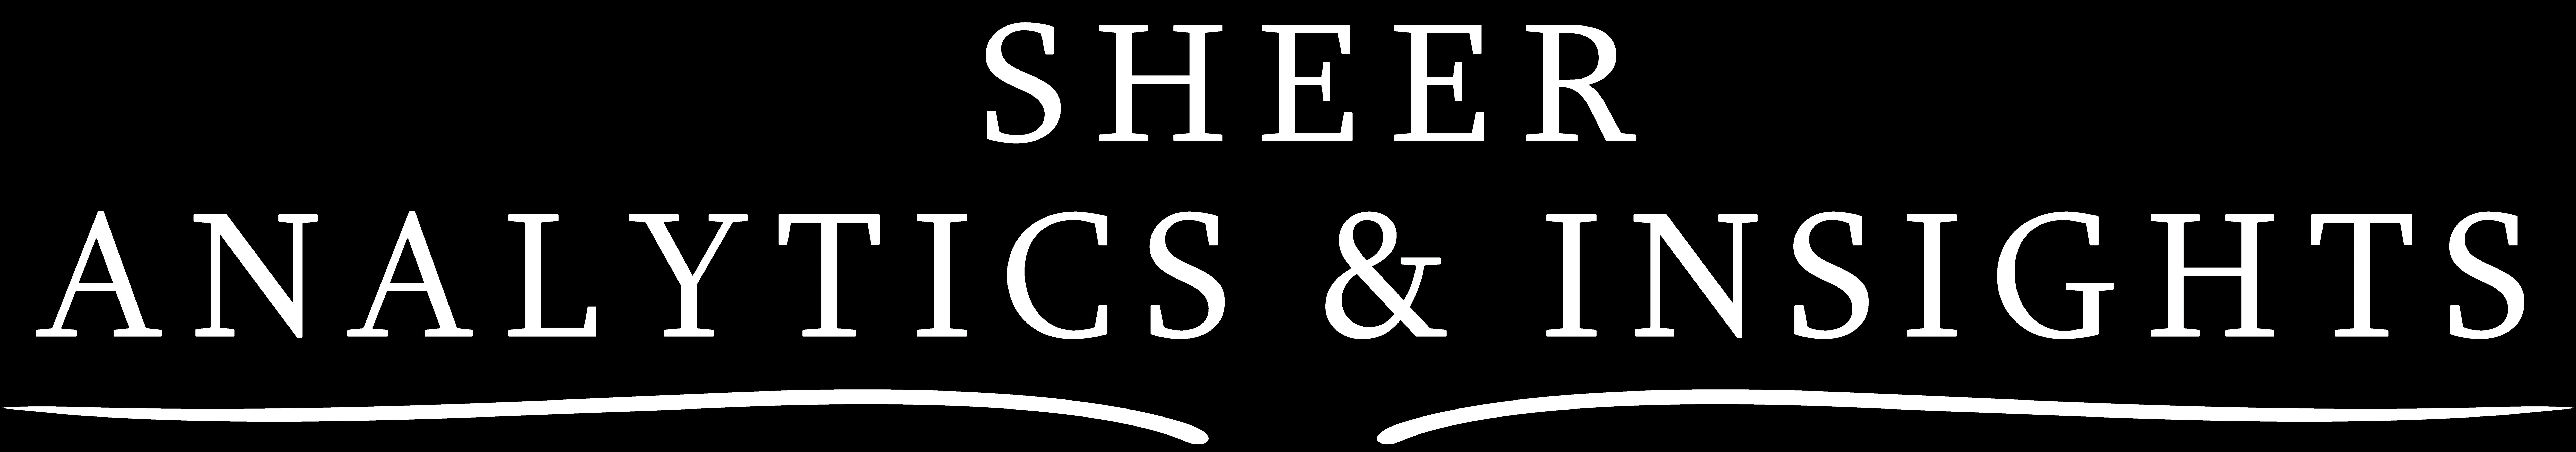 Sheer Analytics And Insights